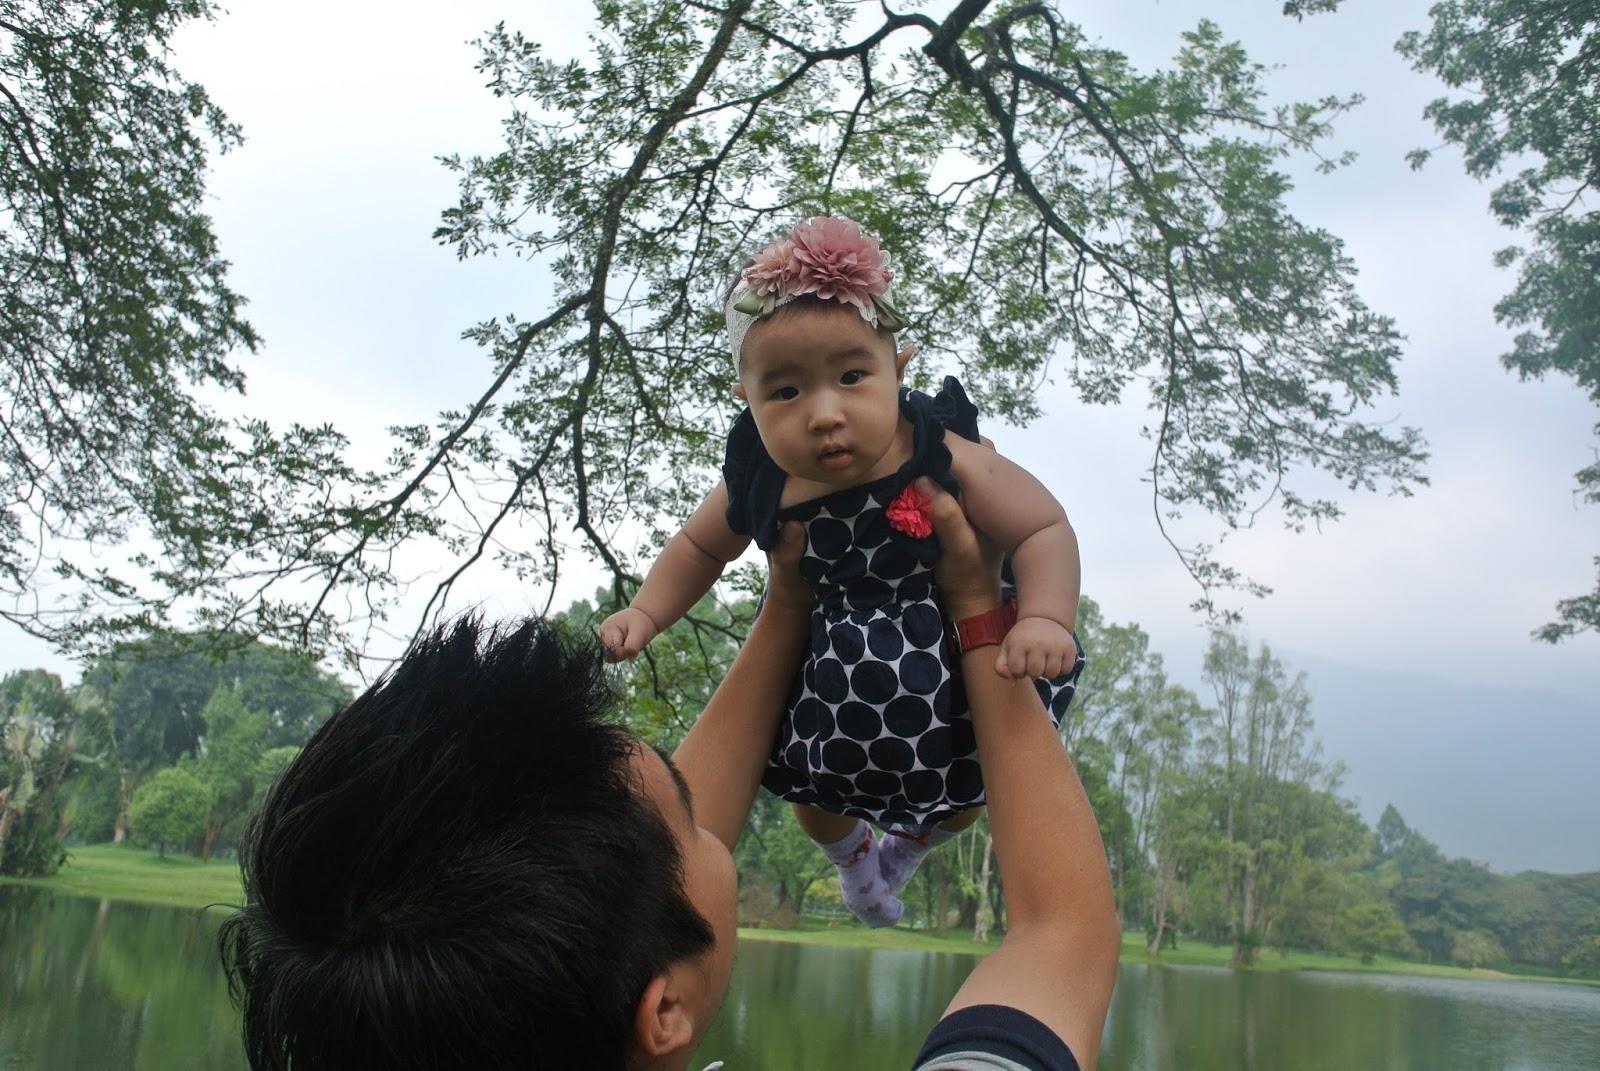 jerantut girls Kuantan: a month-old baby girl was found near an oil palm tree along the sungai lekok road, lata meraung, near jerantut, on monday night jerantut police.